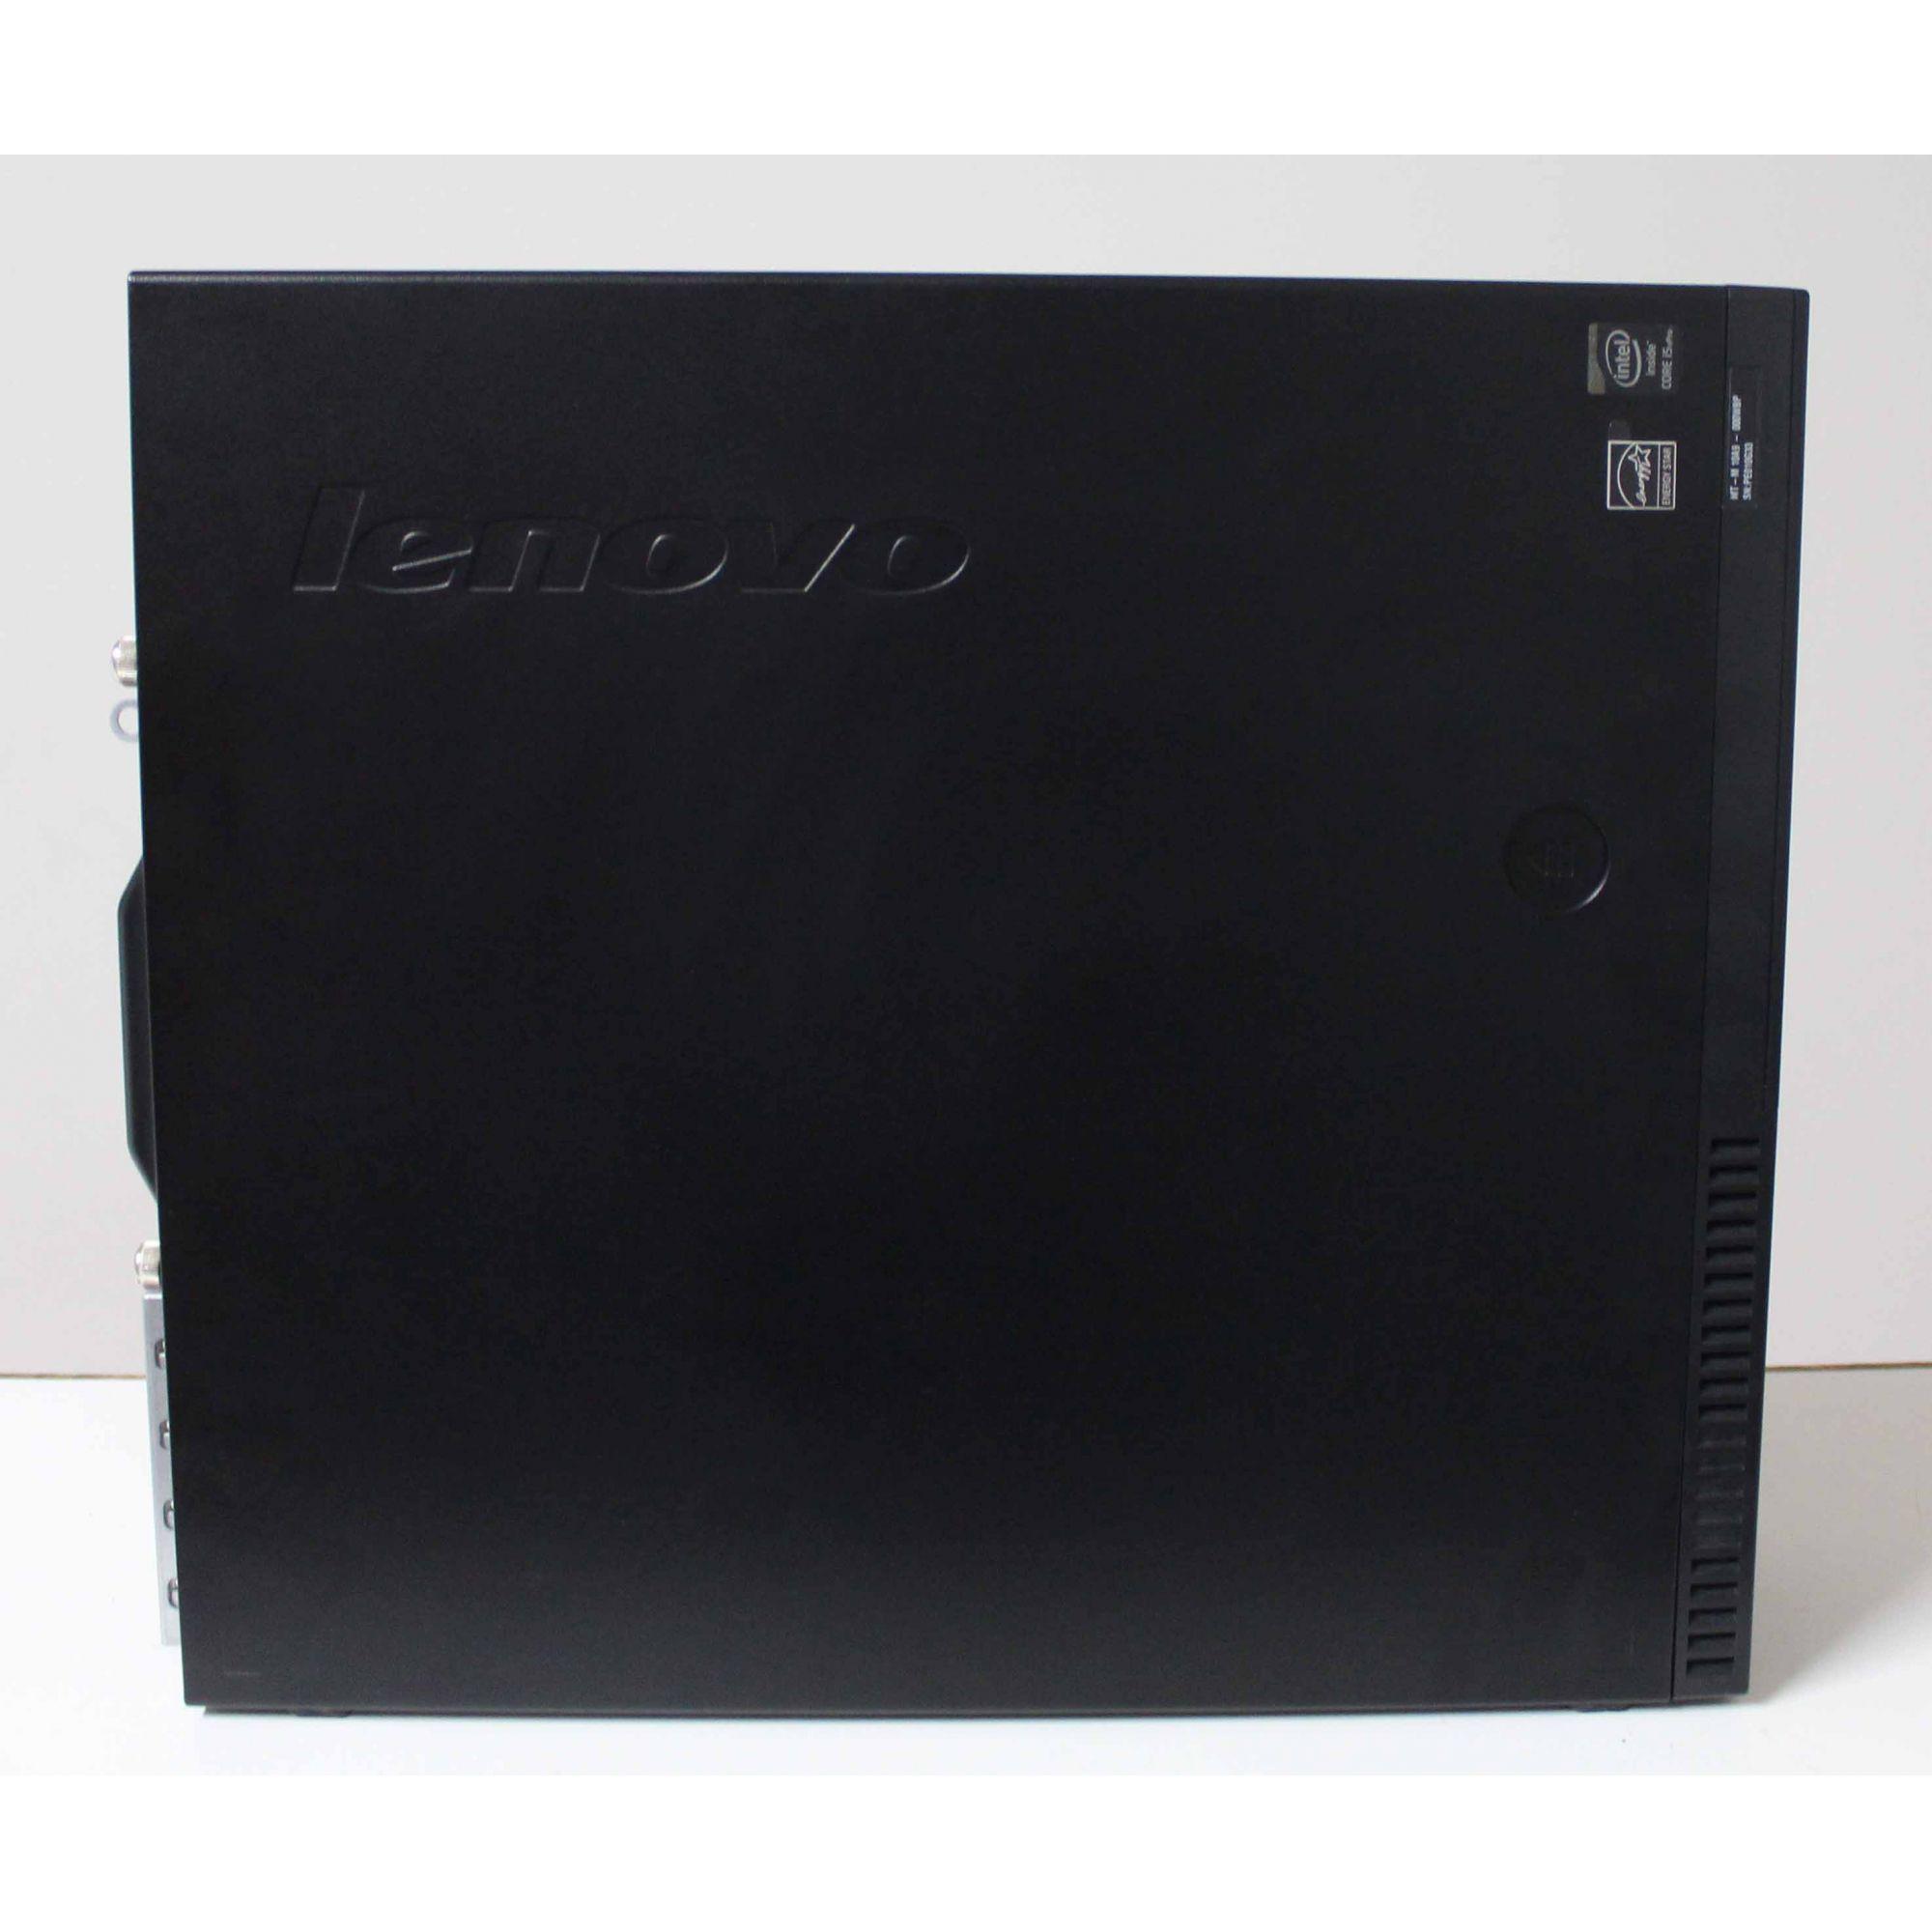 Computador Lenovo ThinkCentre M93p Intel Core i5 3.2GHz 4GB HD-500GB